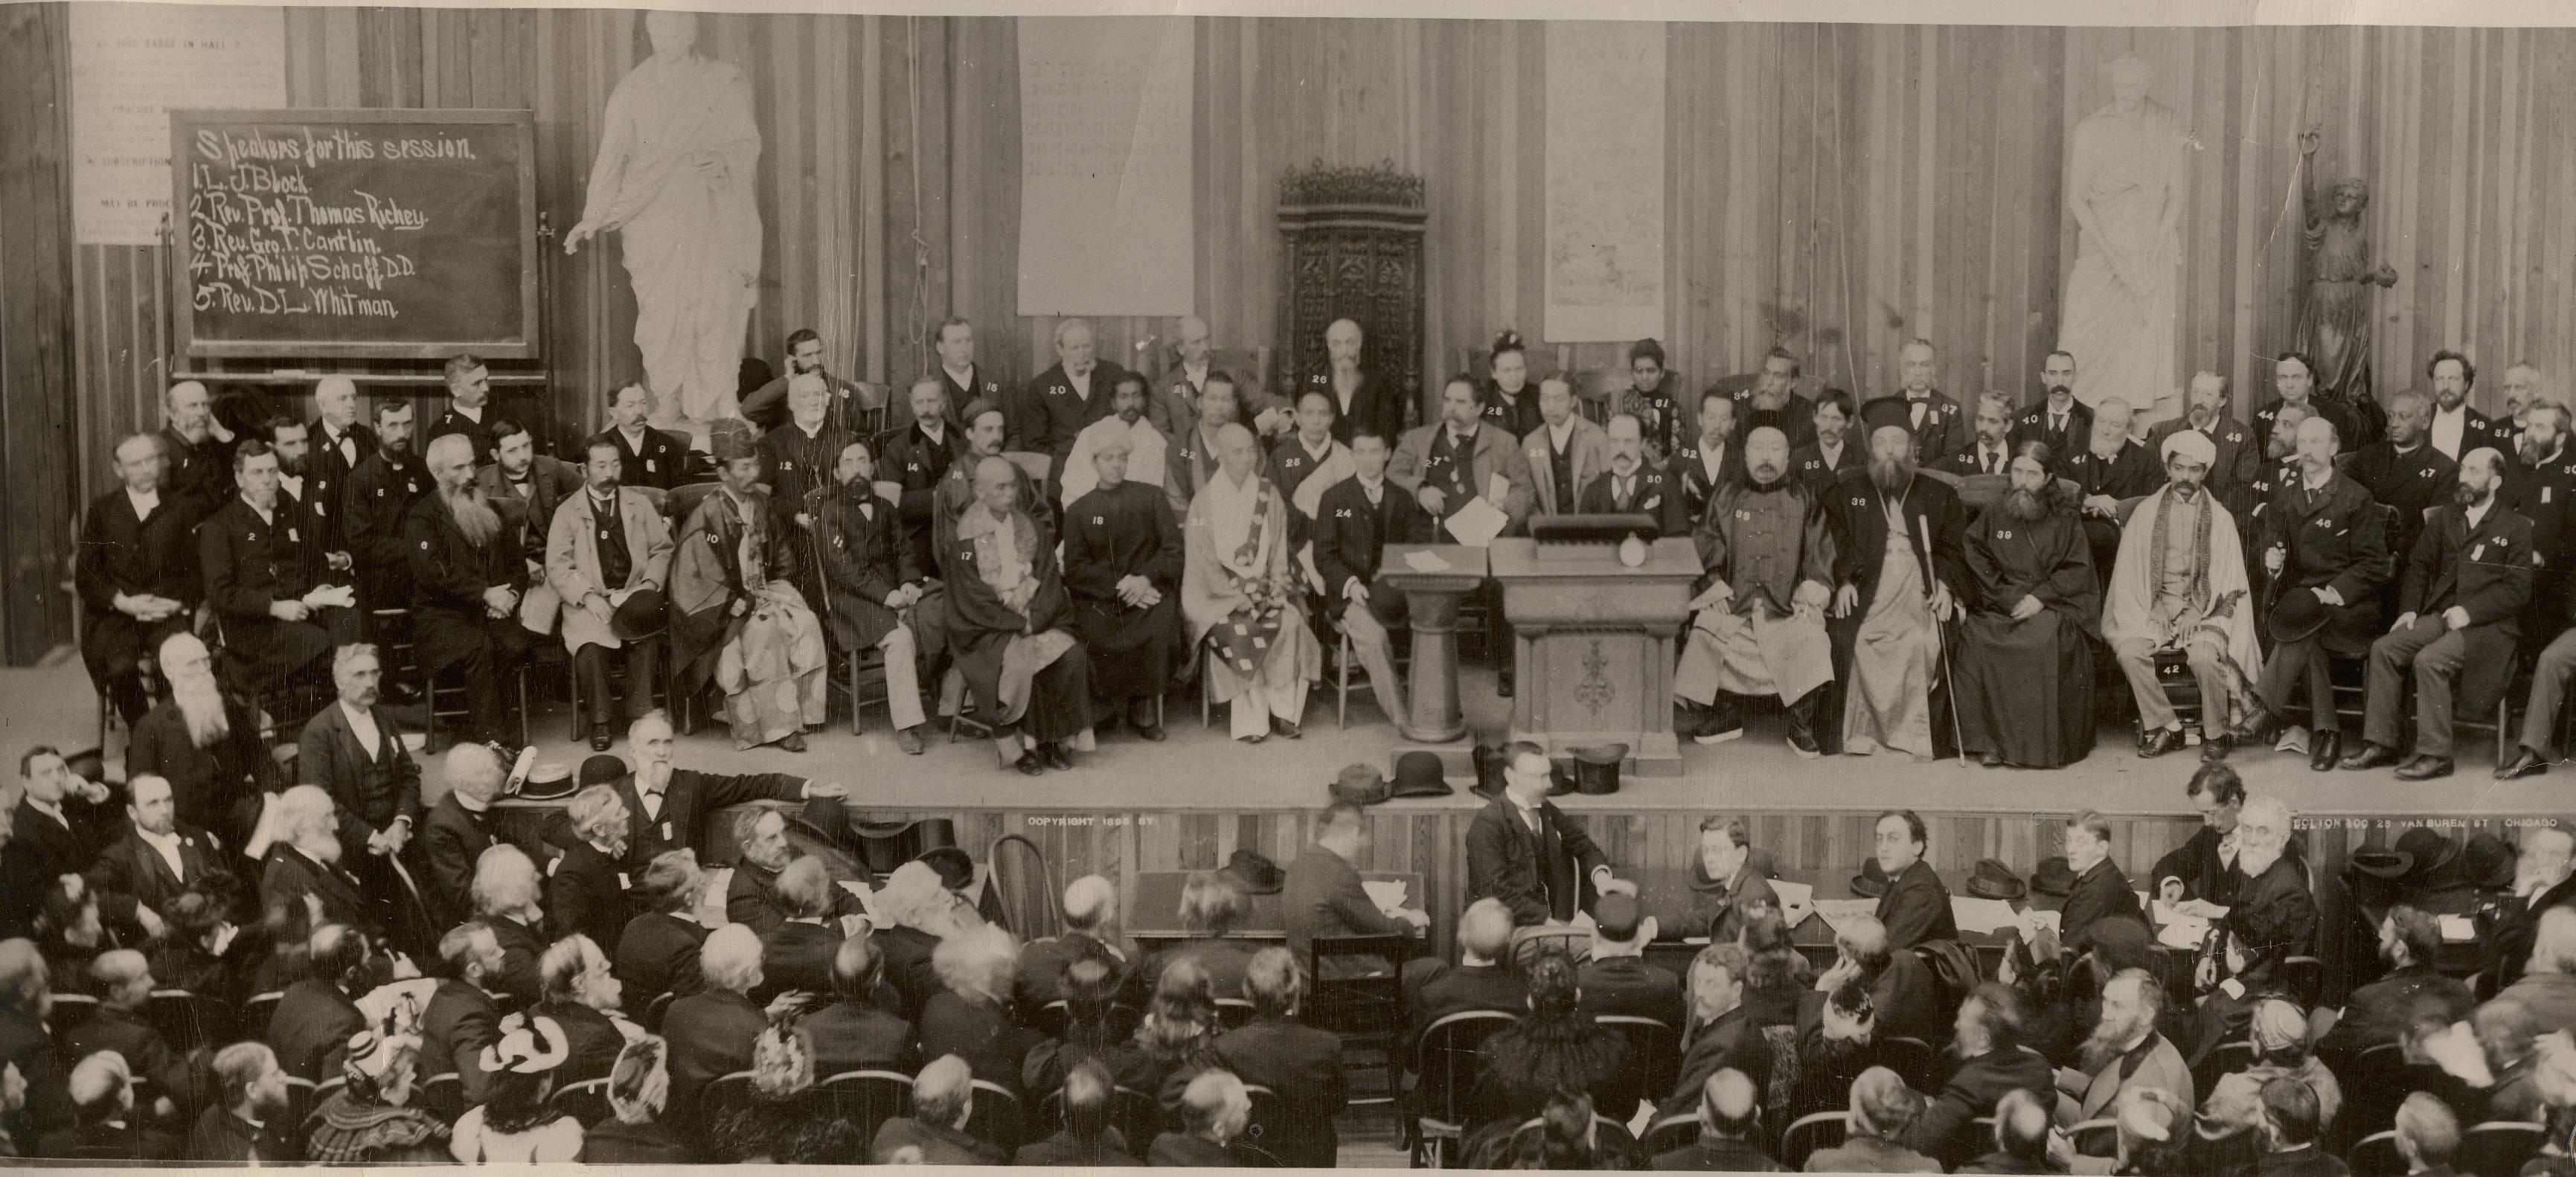 File:1893parliament.jpg